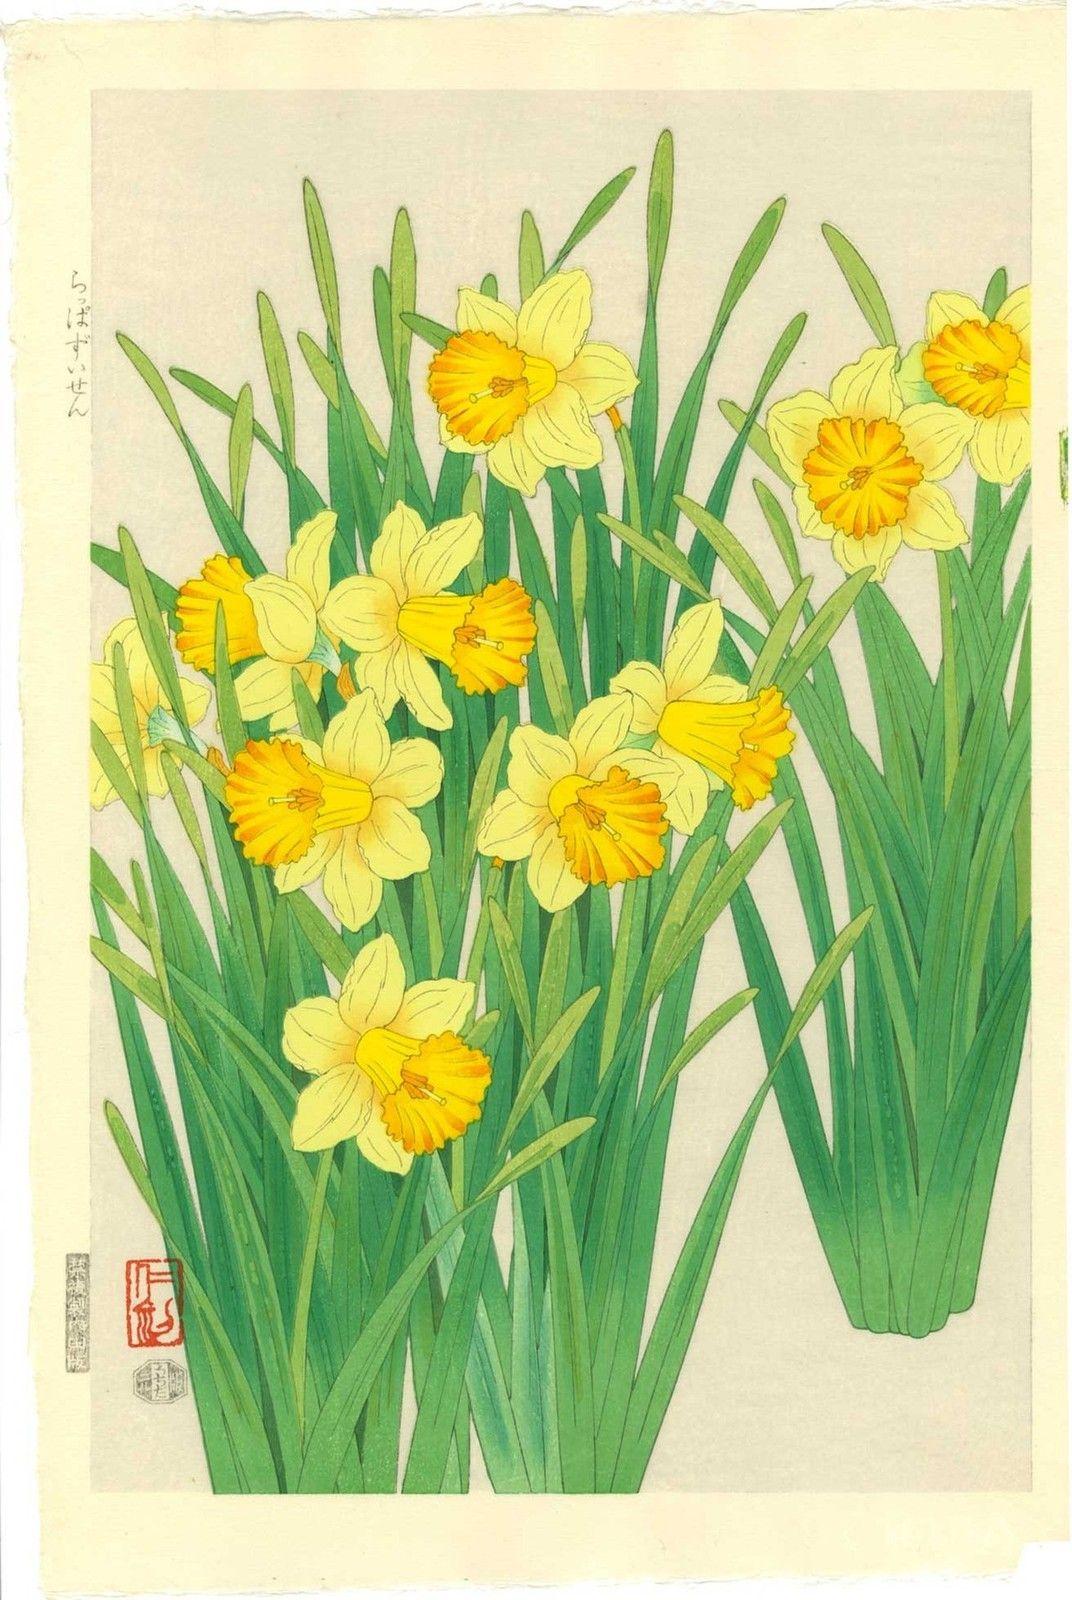 Nisaburo Ito Japanese Woodblock Print Daffodils 1950s Ebay Japanese Woodblock Printing Japanese Art Styles Japanese Artwork